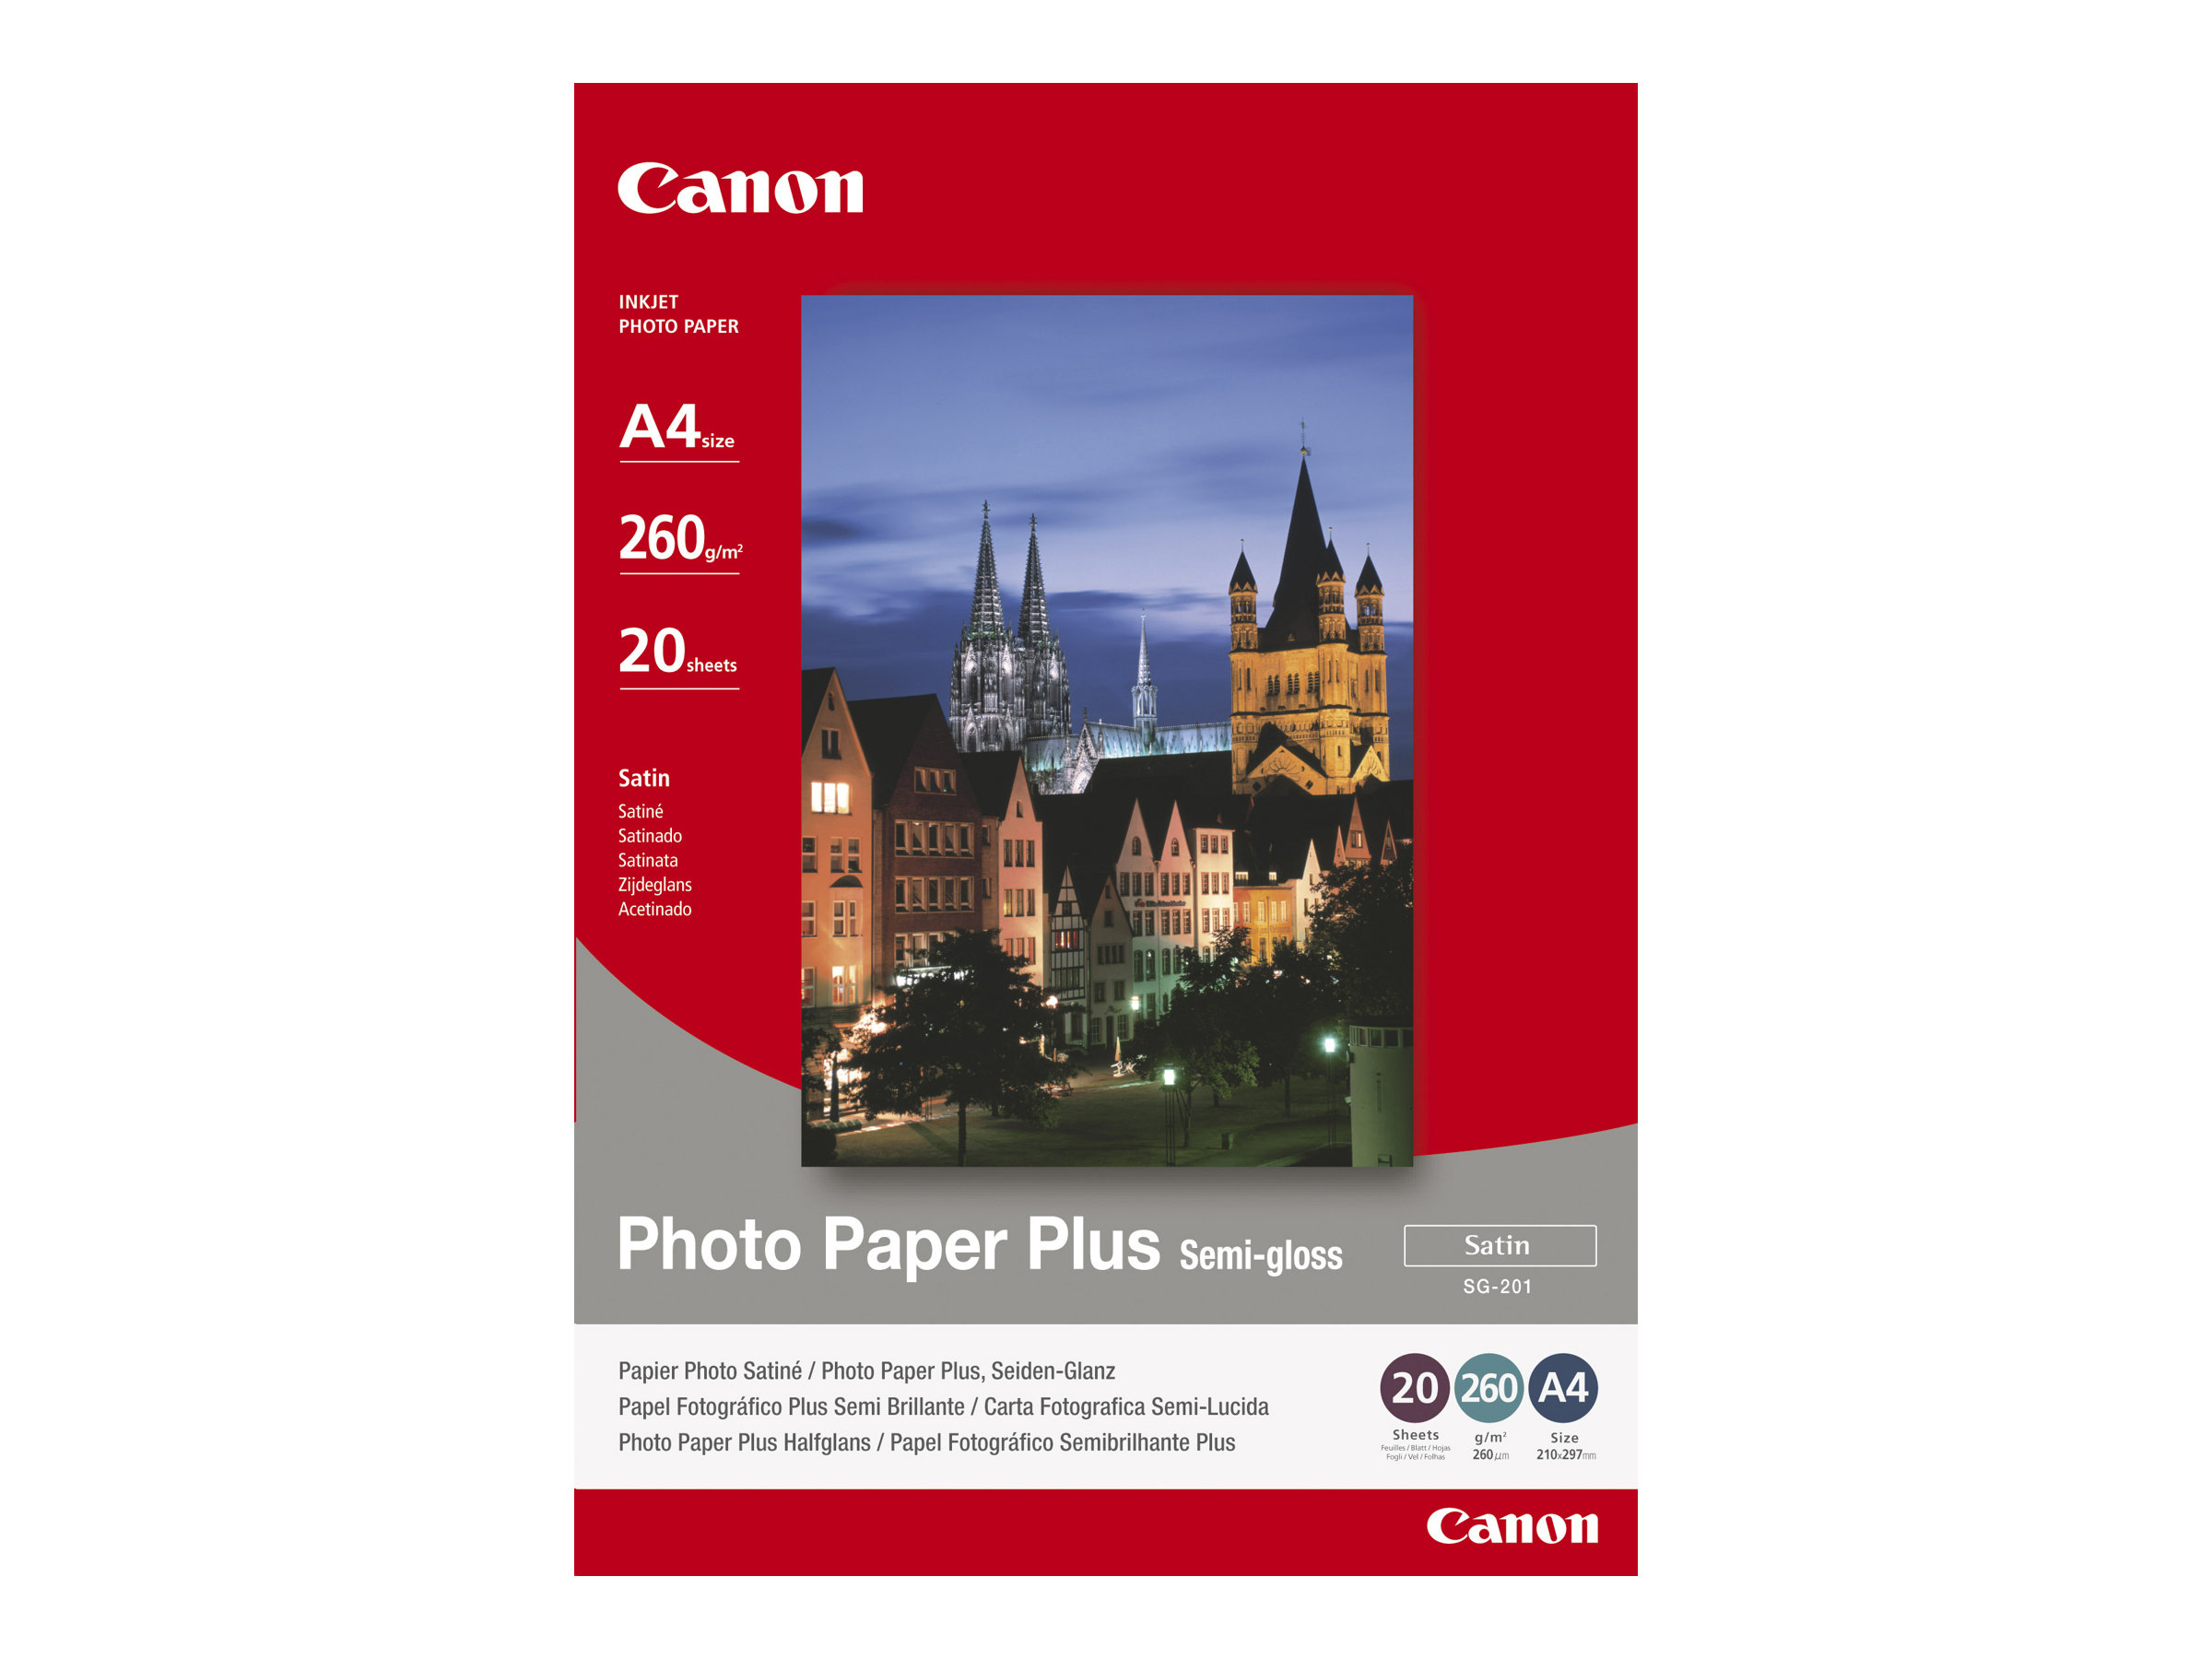 Canon Photo Paper Plus SG-201 - Halbglänzend satiniert - 101.6 x 152.4 mm - 260 g/m² - 50 Blatt Fotopapier - für PIXMA iP3680, i